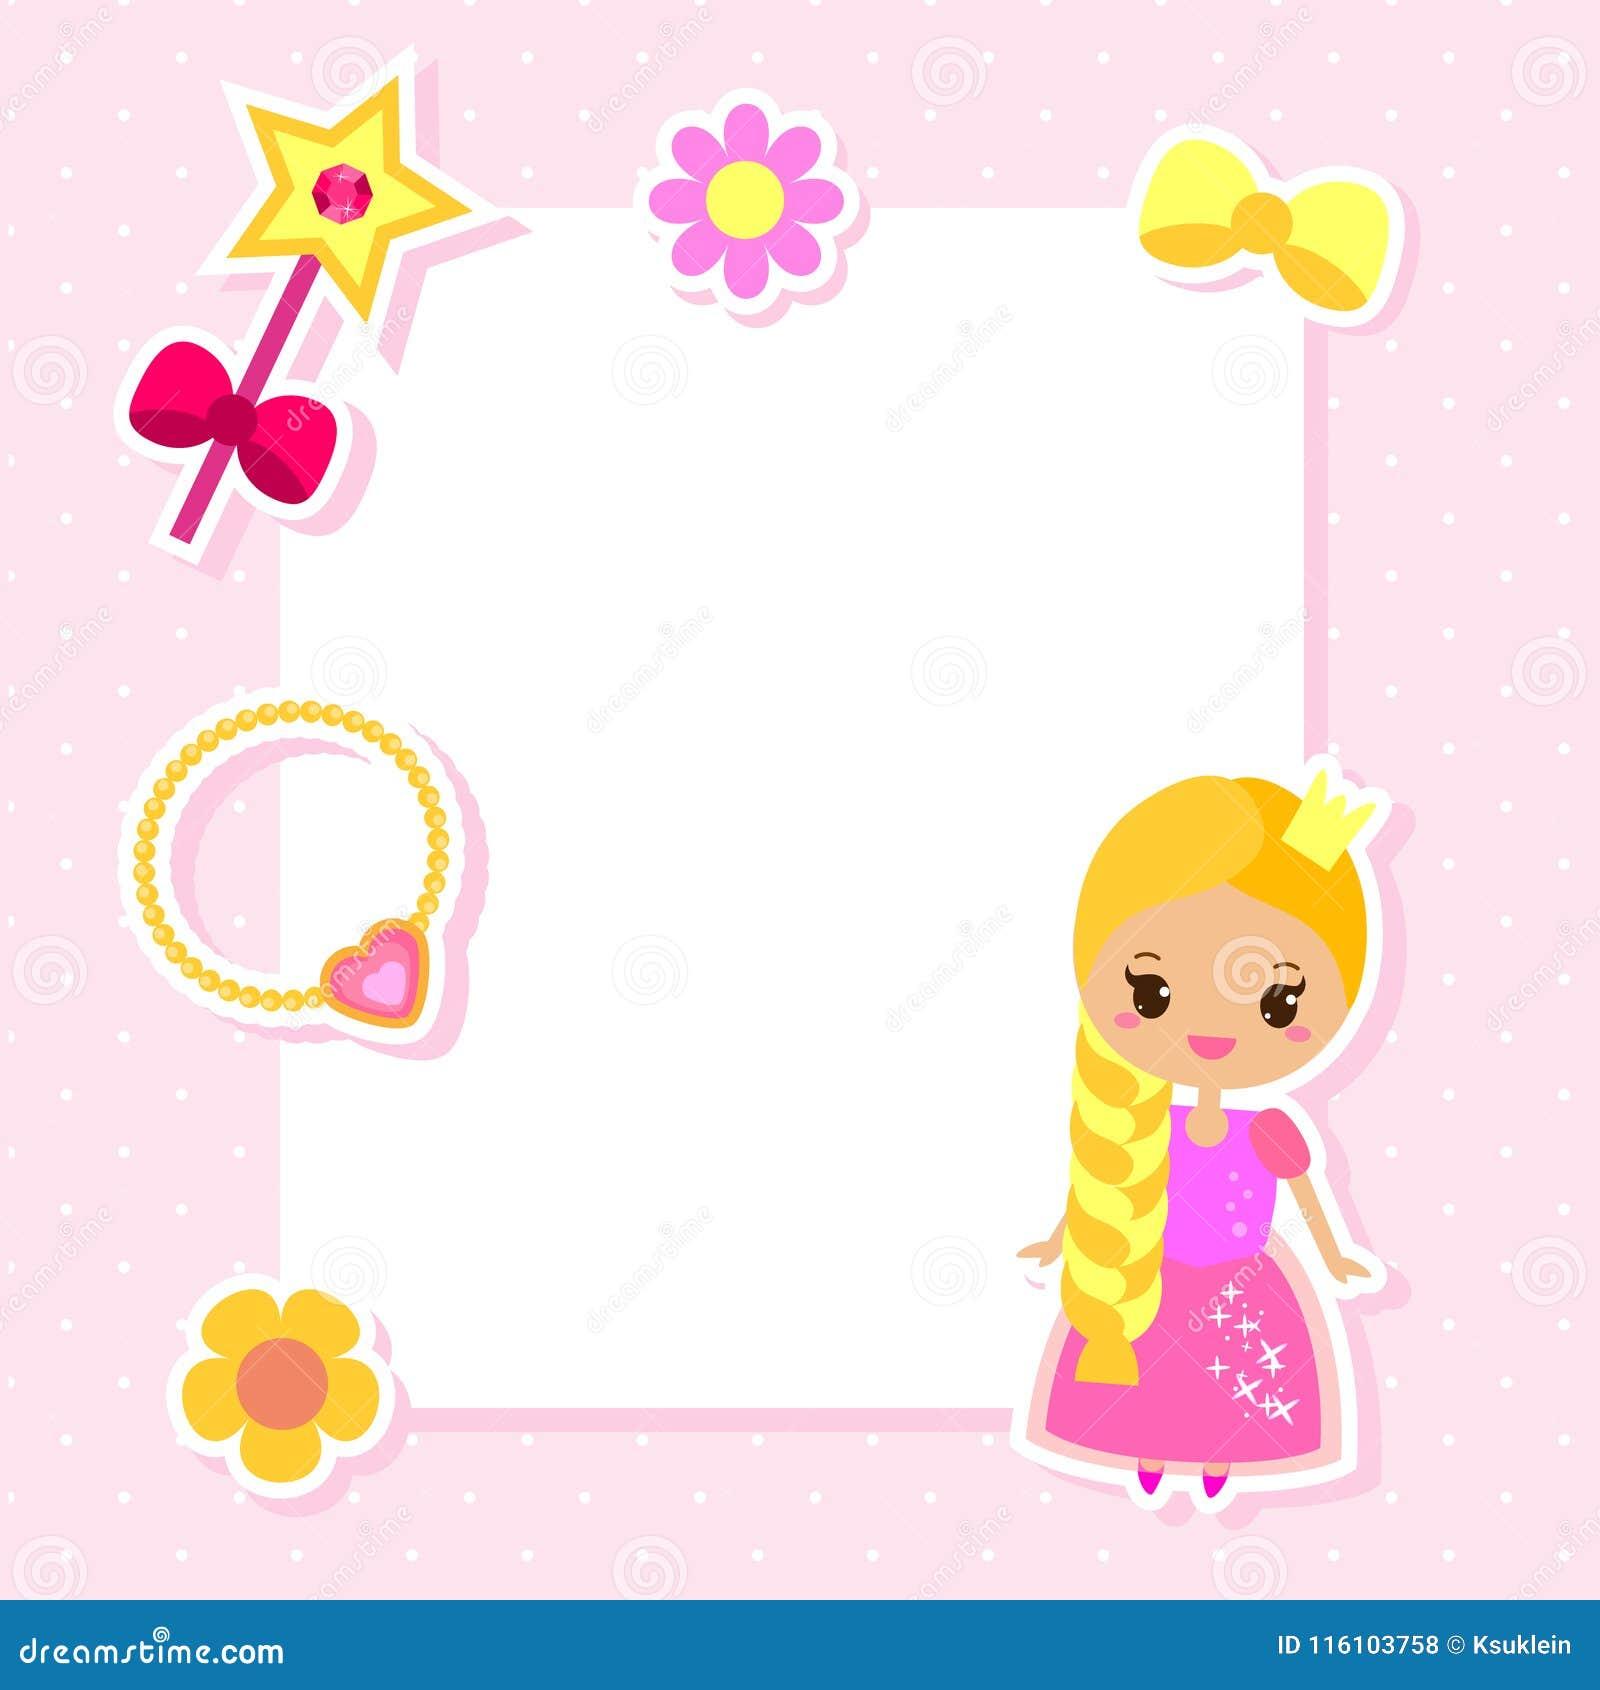 Princess Frame Design Template For Photos Children Diplomas Kids